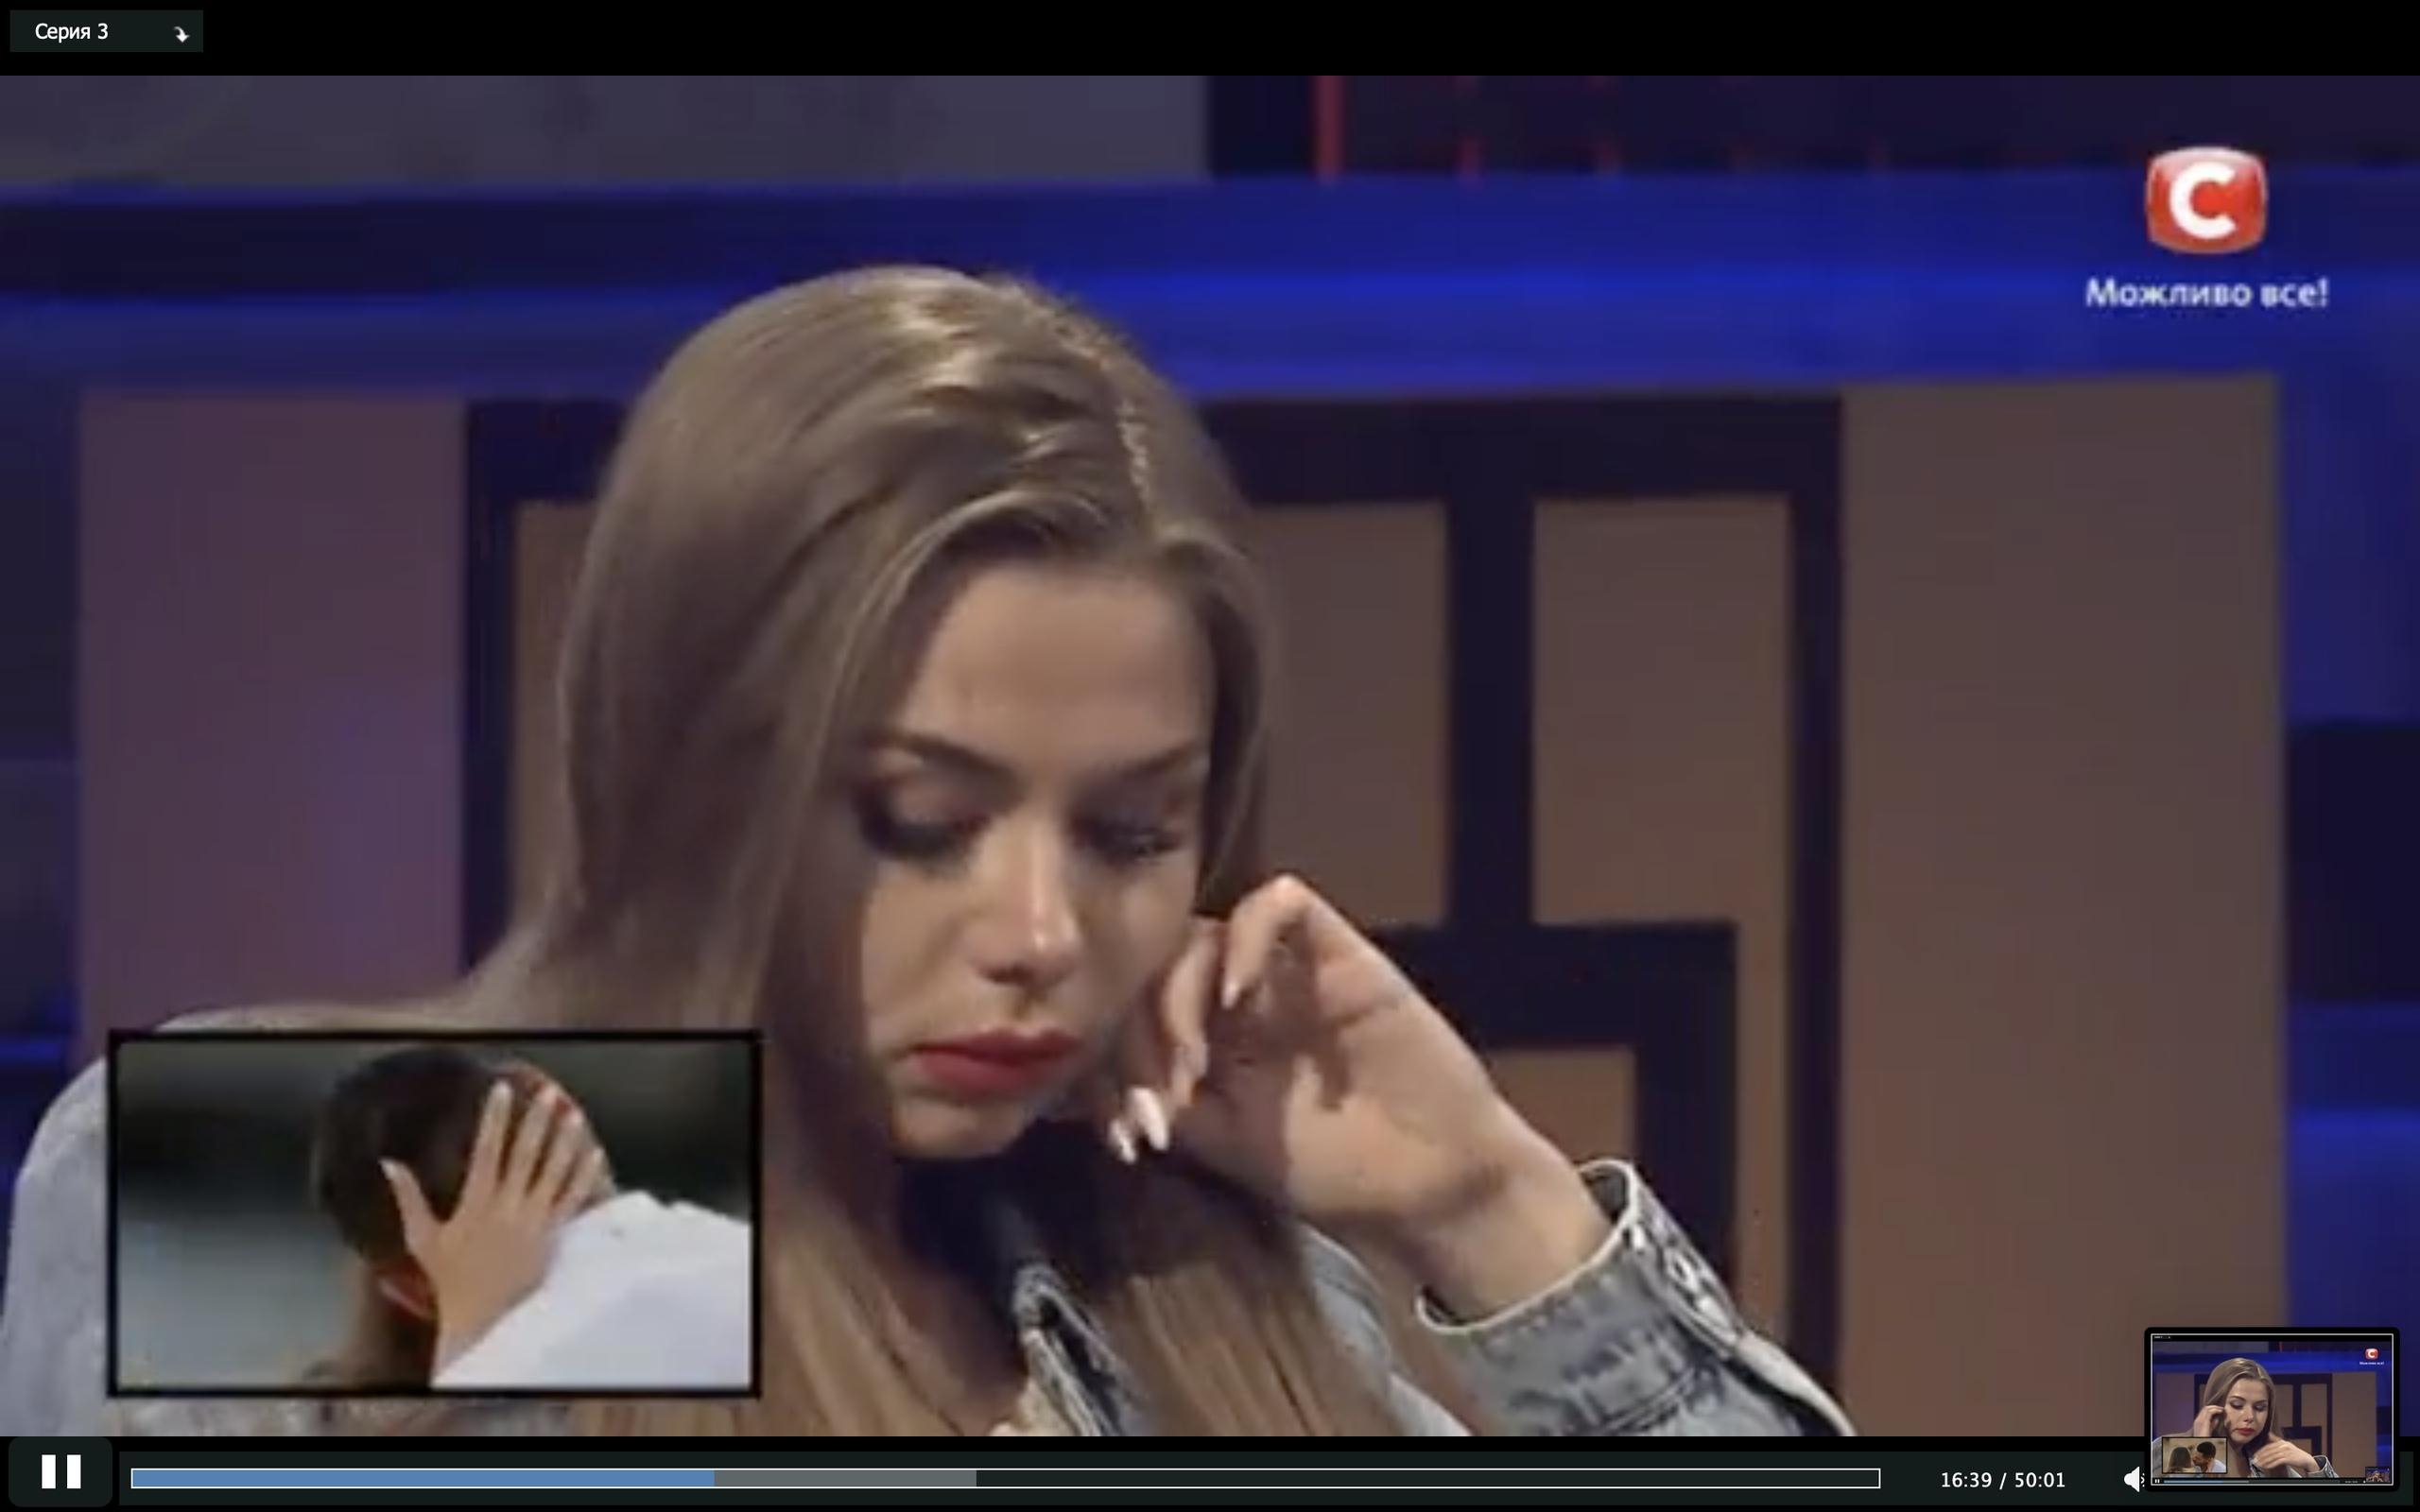 Bachelor Ukraine - Season 9 - Nikita Dobrynin - *Sleuthing Spoilers* - Page 14 K524vjetCTQ